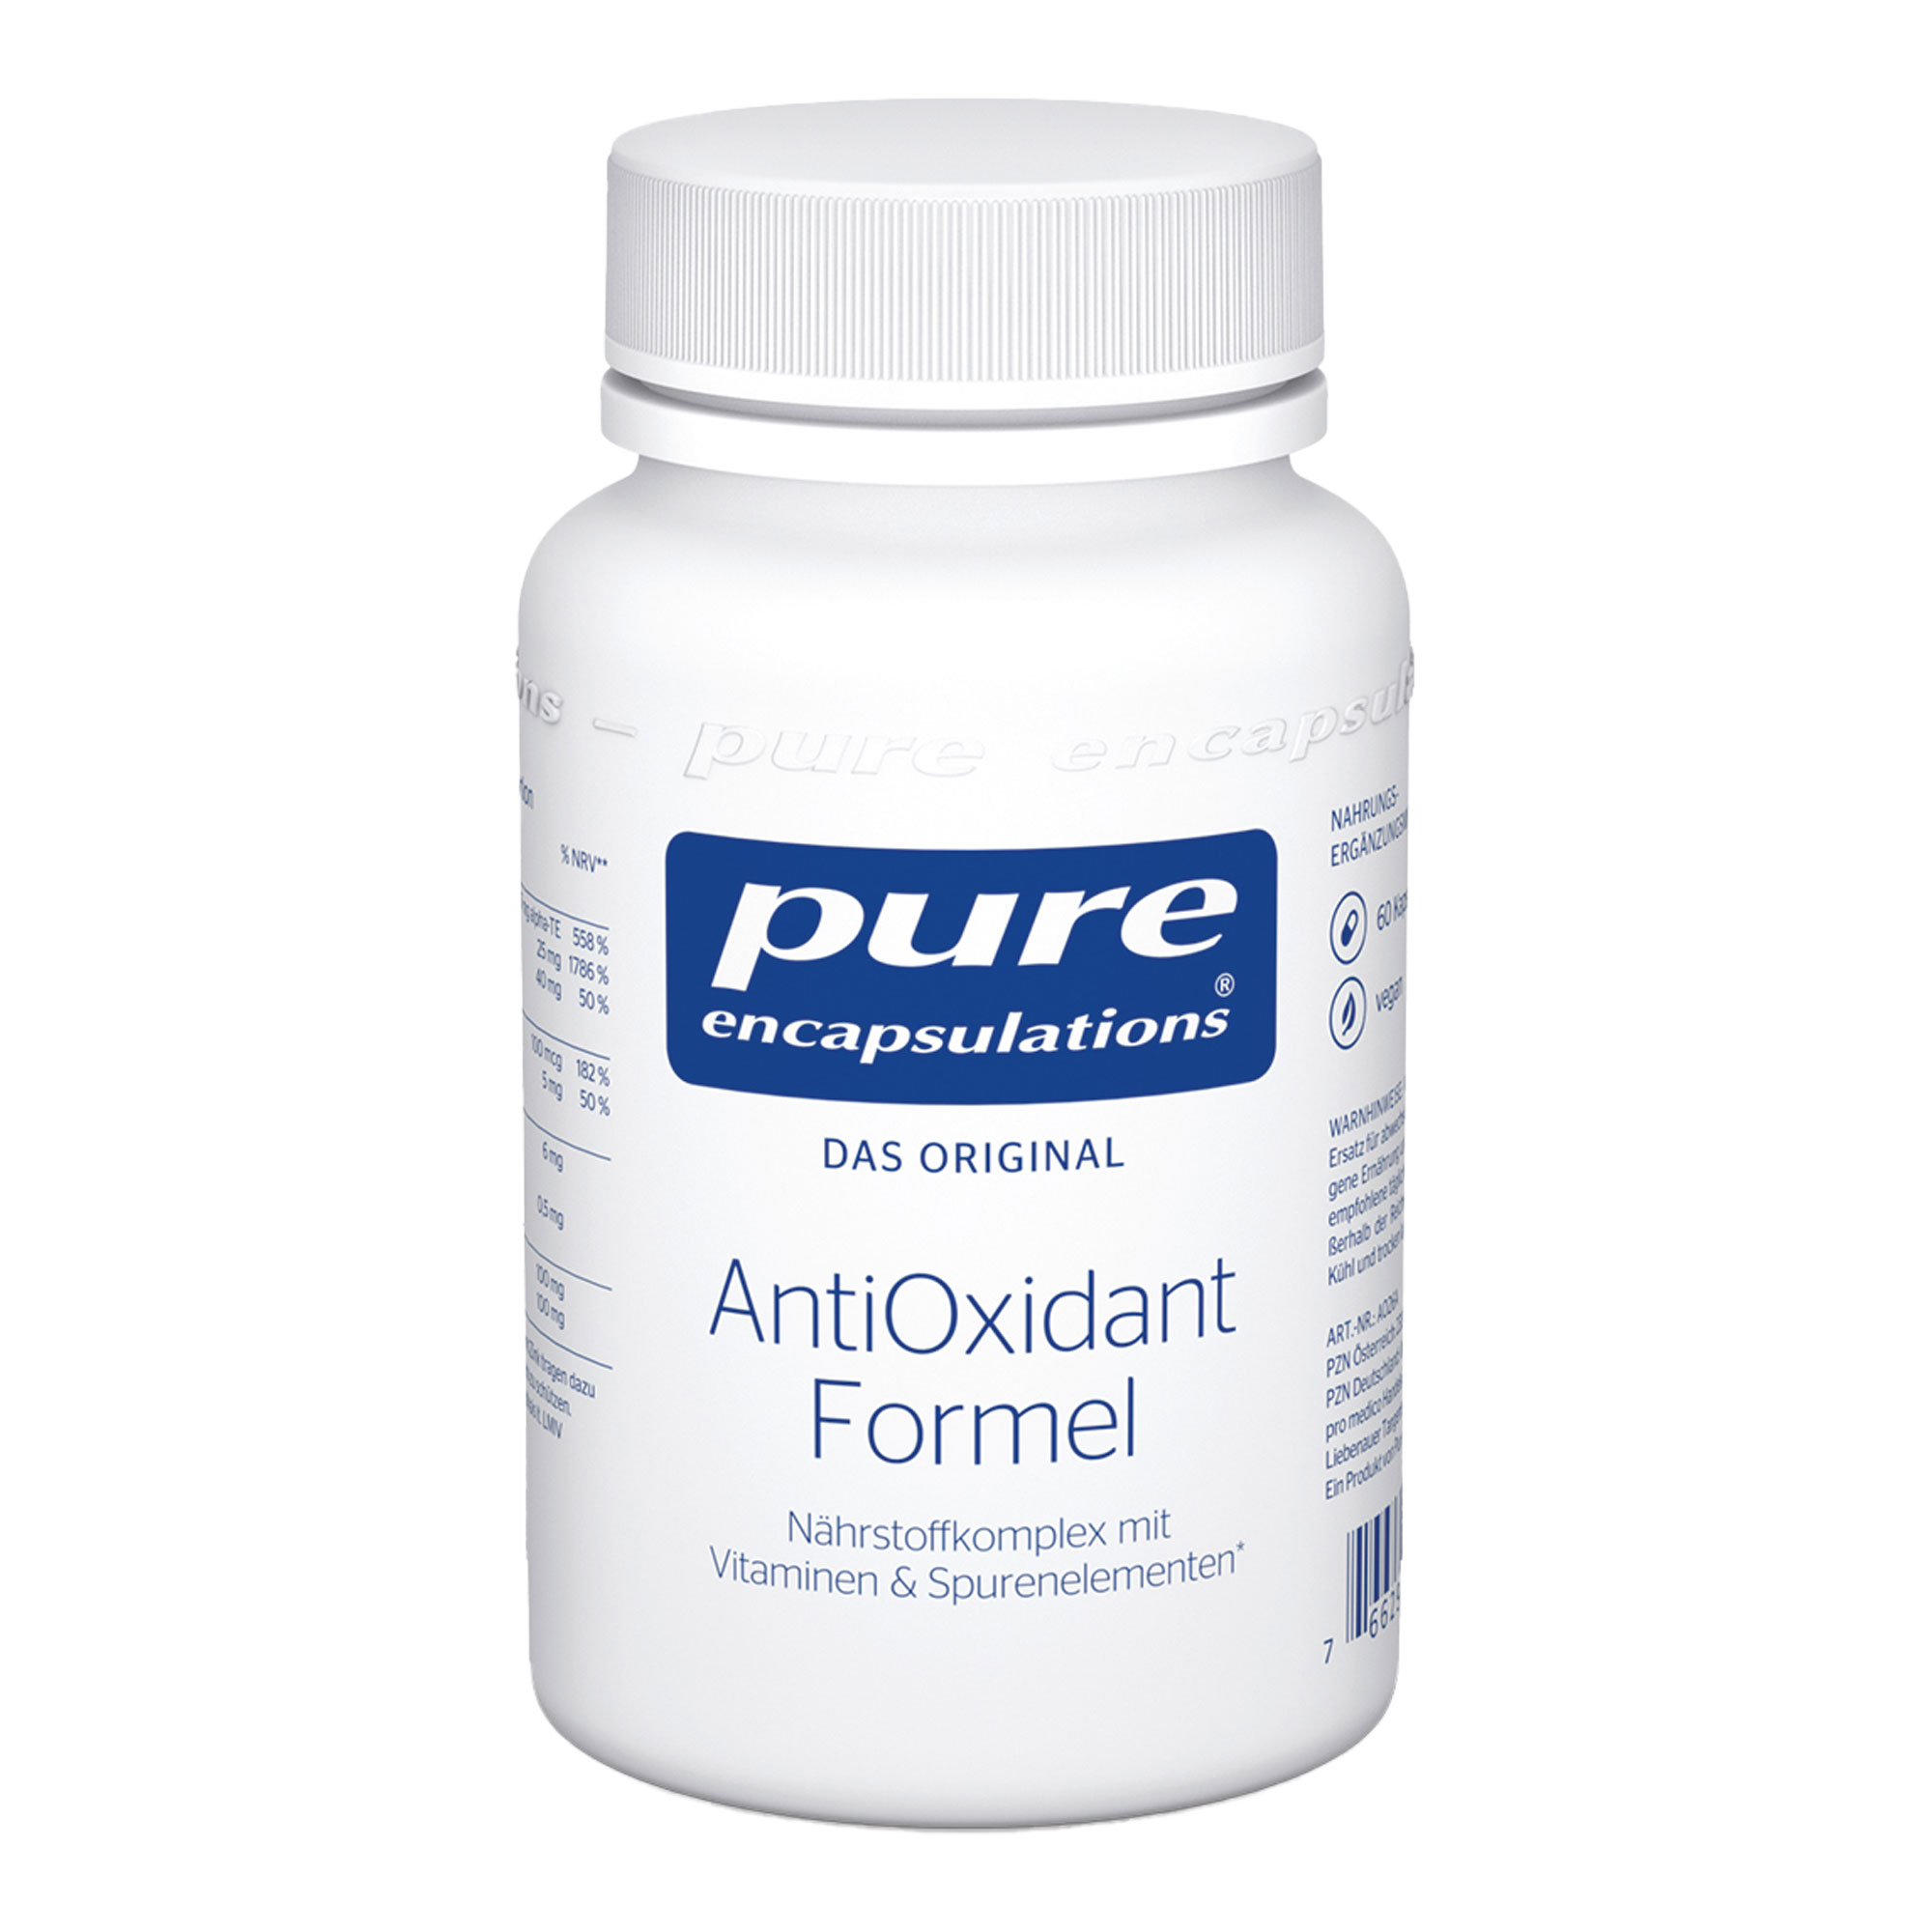 PURE ENCAP ANTIOXIDANT FOR